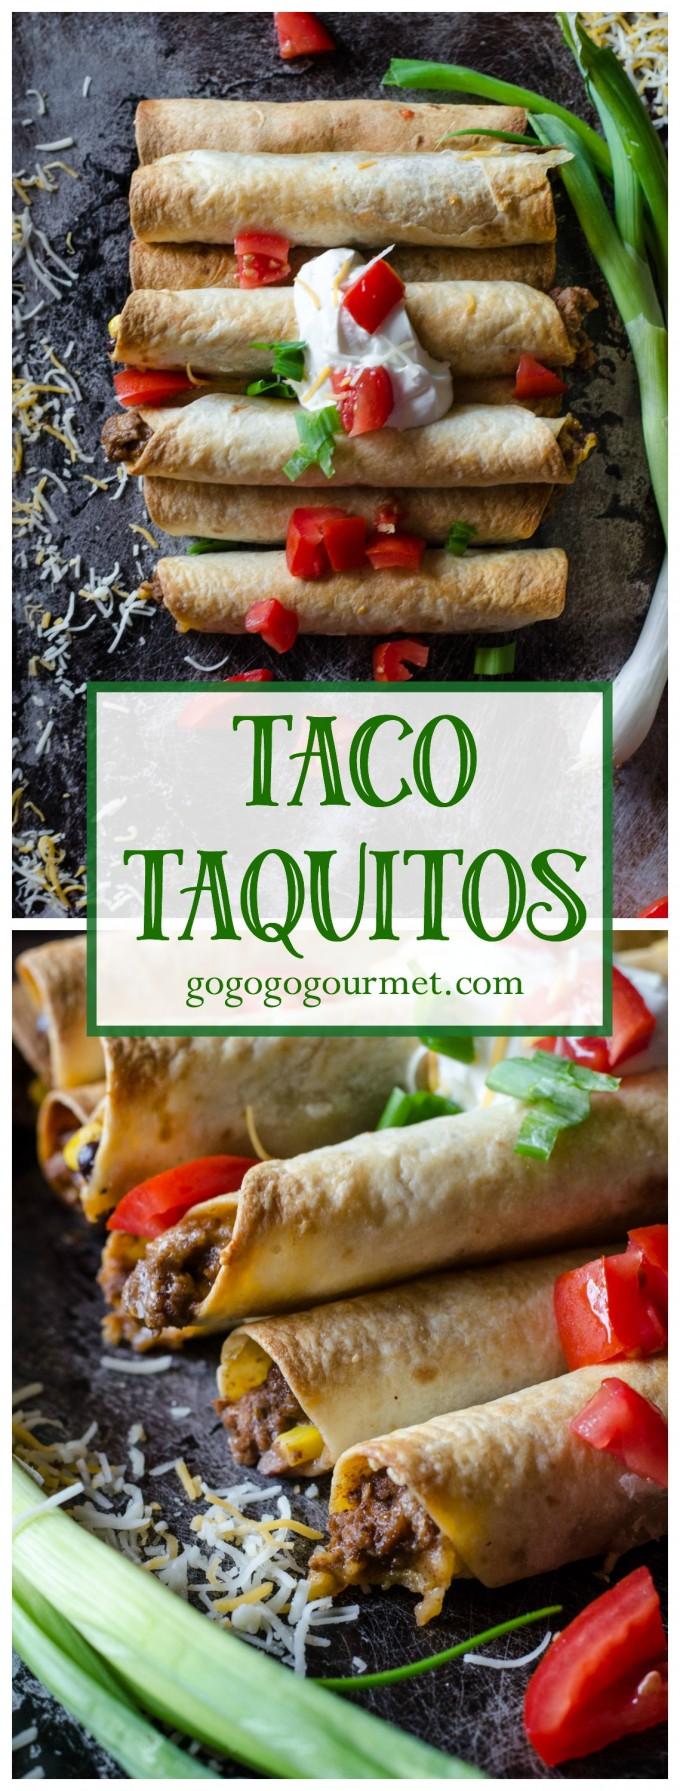 Easy Taco Taquitos- weeknight dinner at its finest! @gogogogourmet via @gogogogourmet